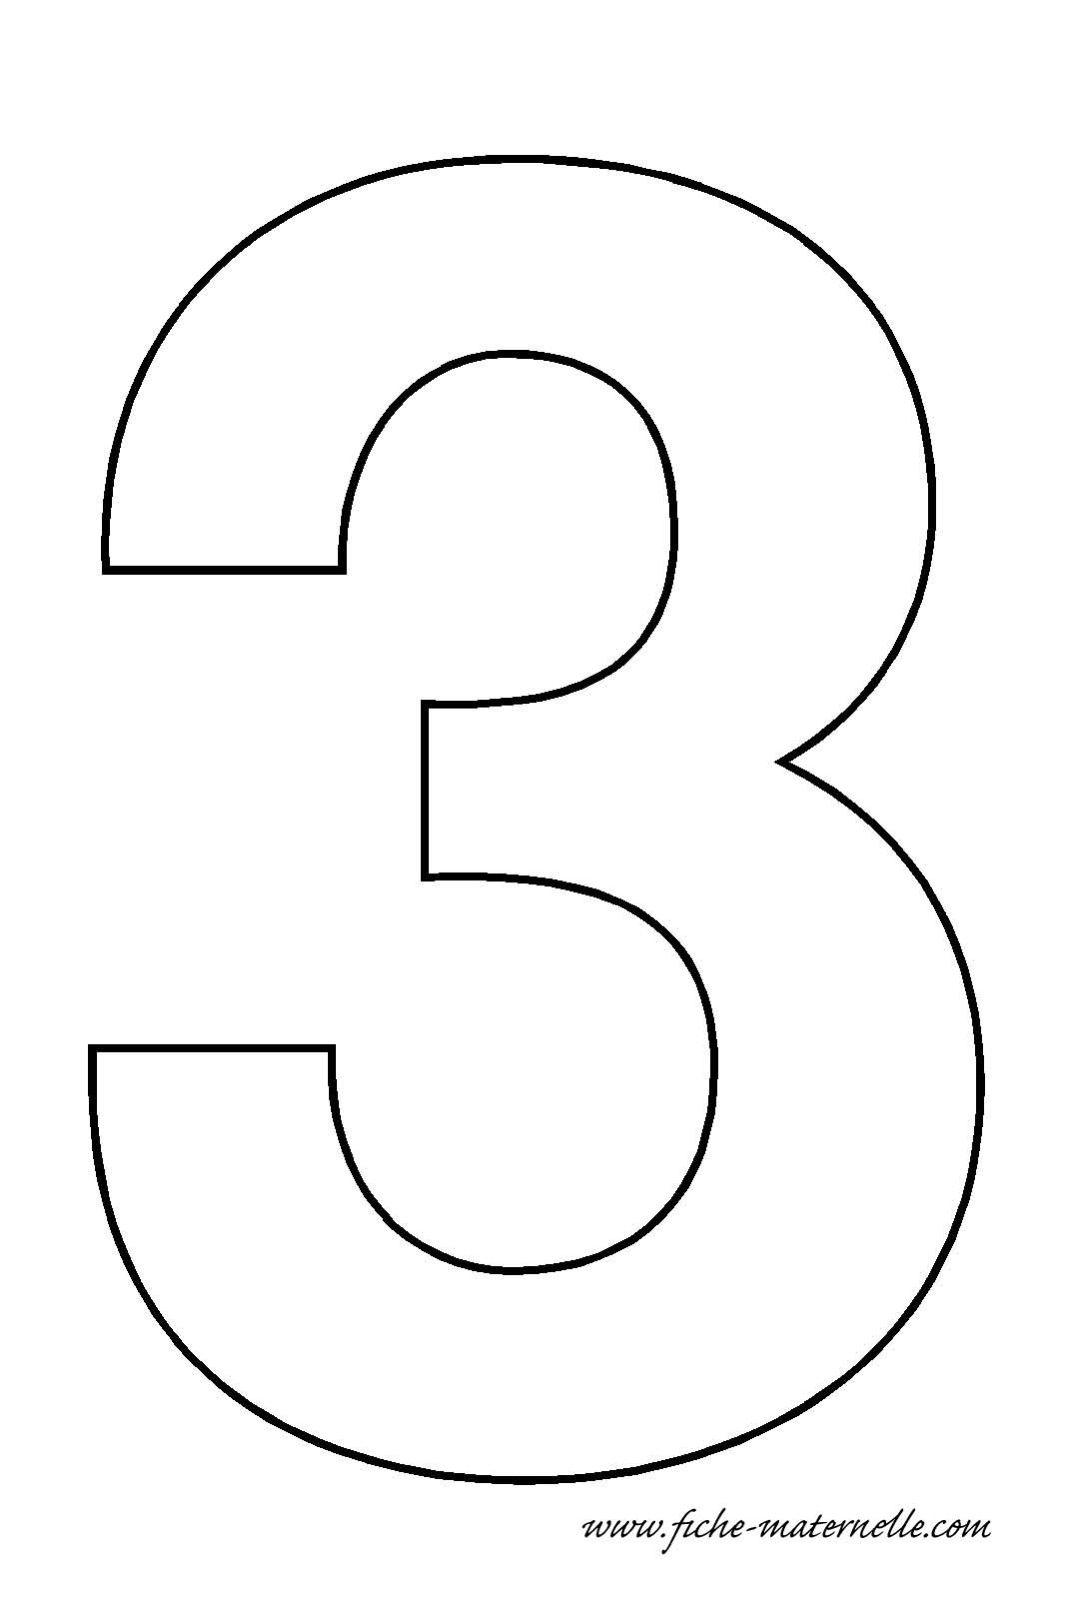 worksheet Birthday Math Worksheets pin by jose overtoom on cijfers en getallen pinterest maths craftsactvities and worksheets for preschooltoddler kindergarten lots of coloring pages